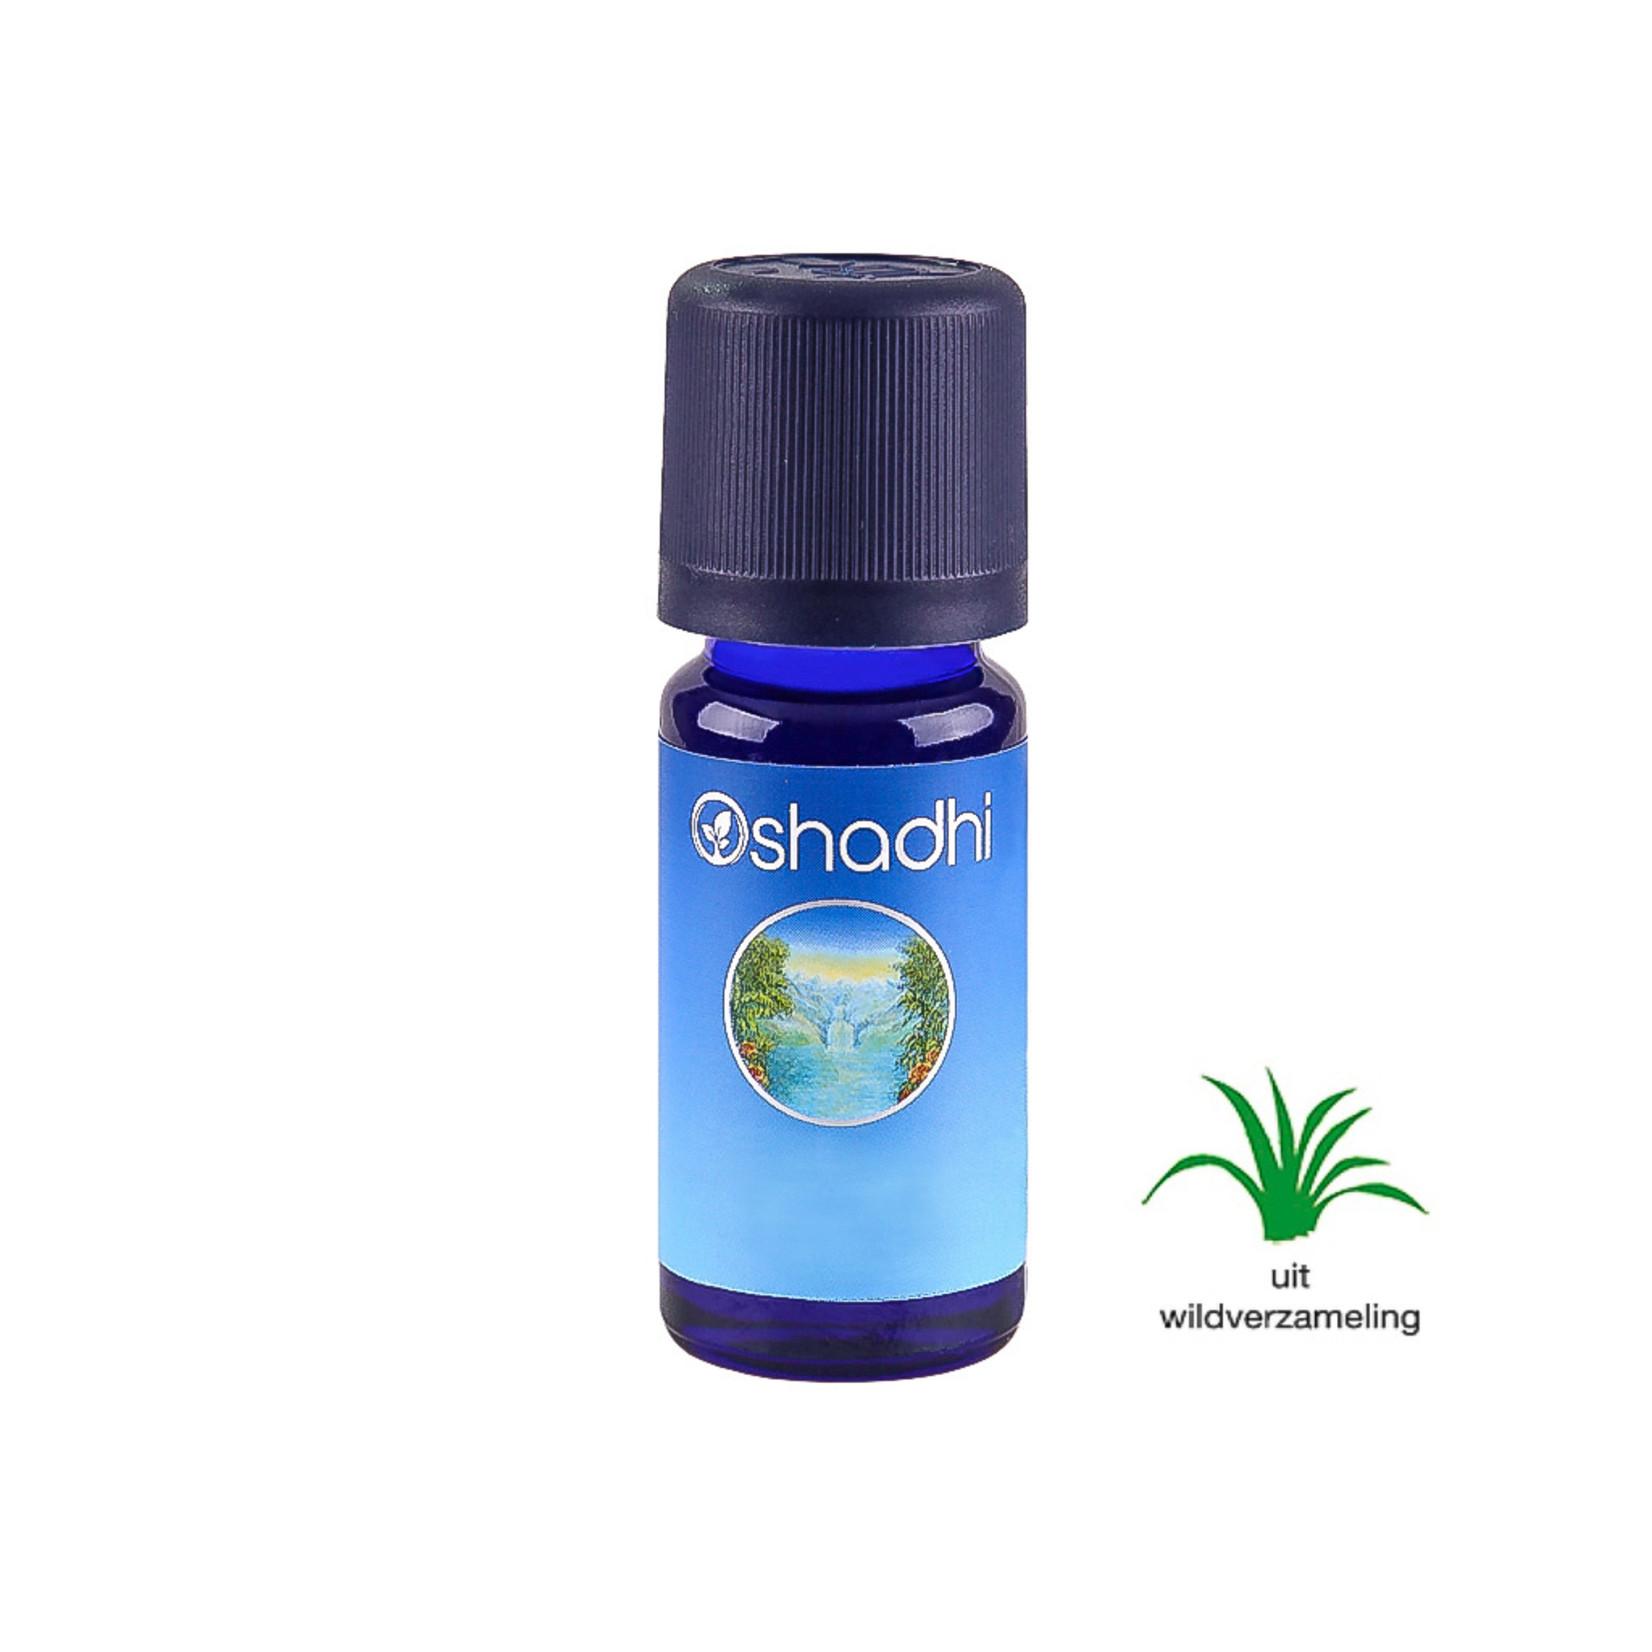 Oshadhi Ho-hout Oshadhi - moed en geborgenheid - 10ml